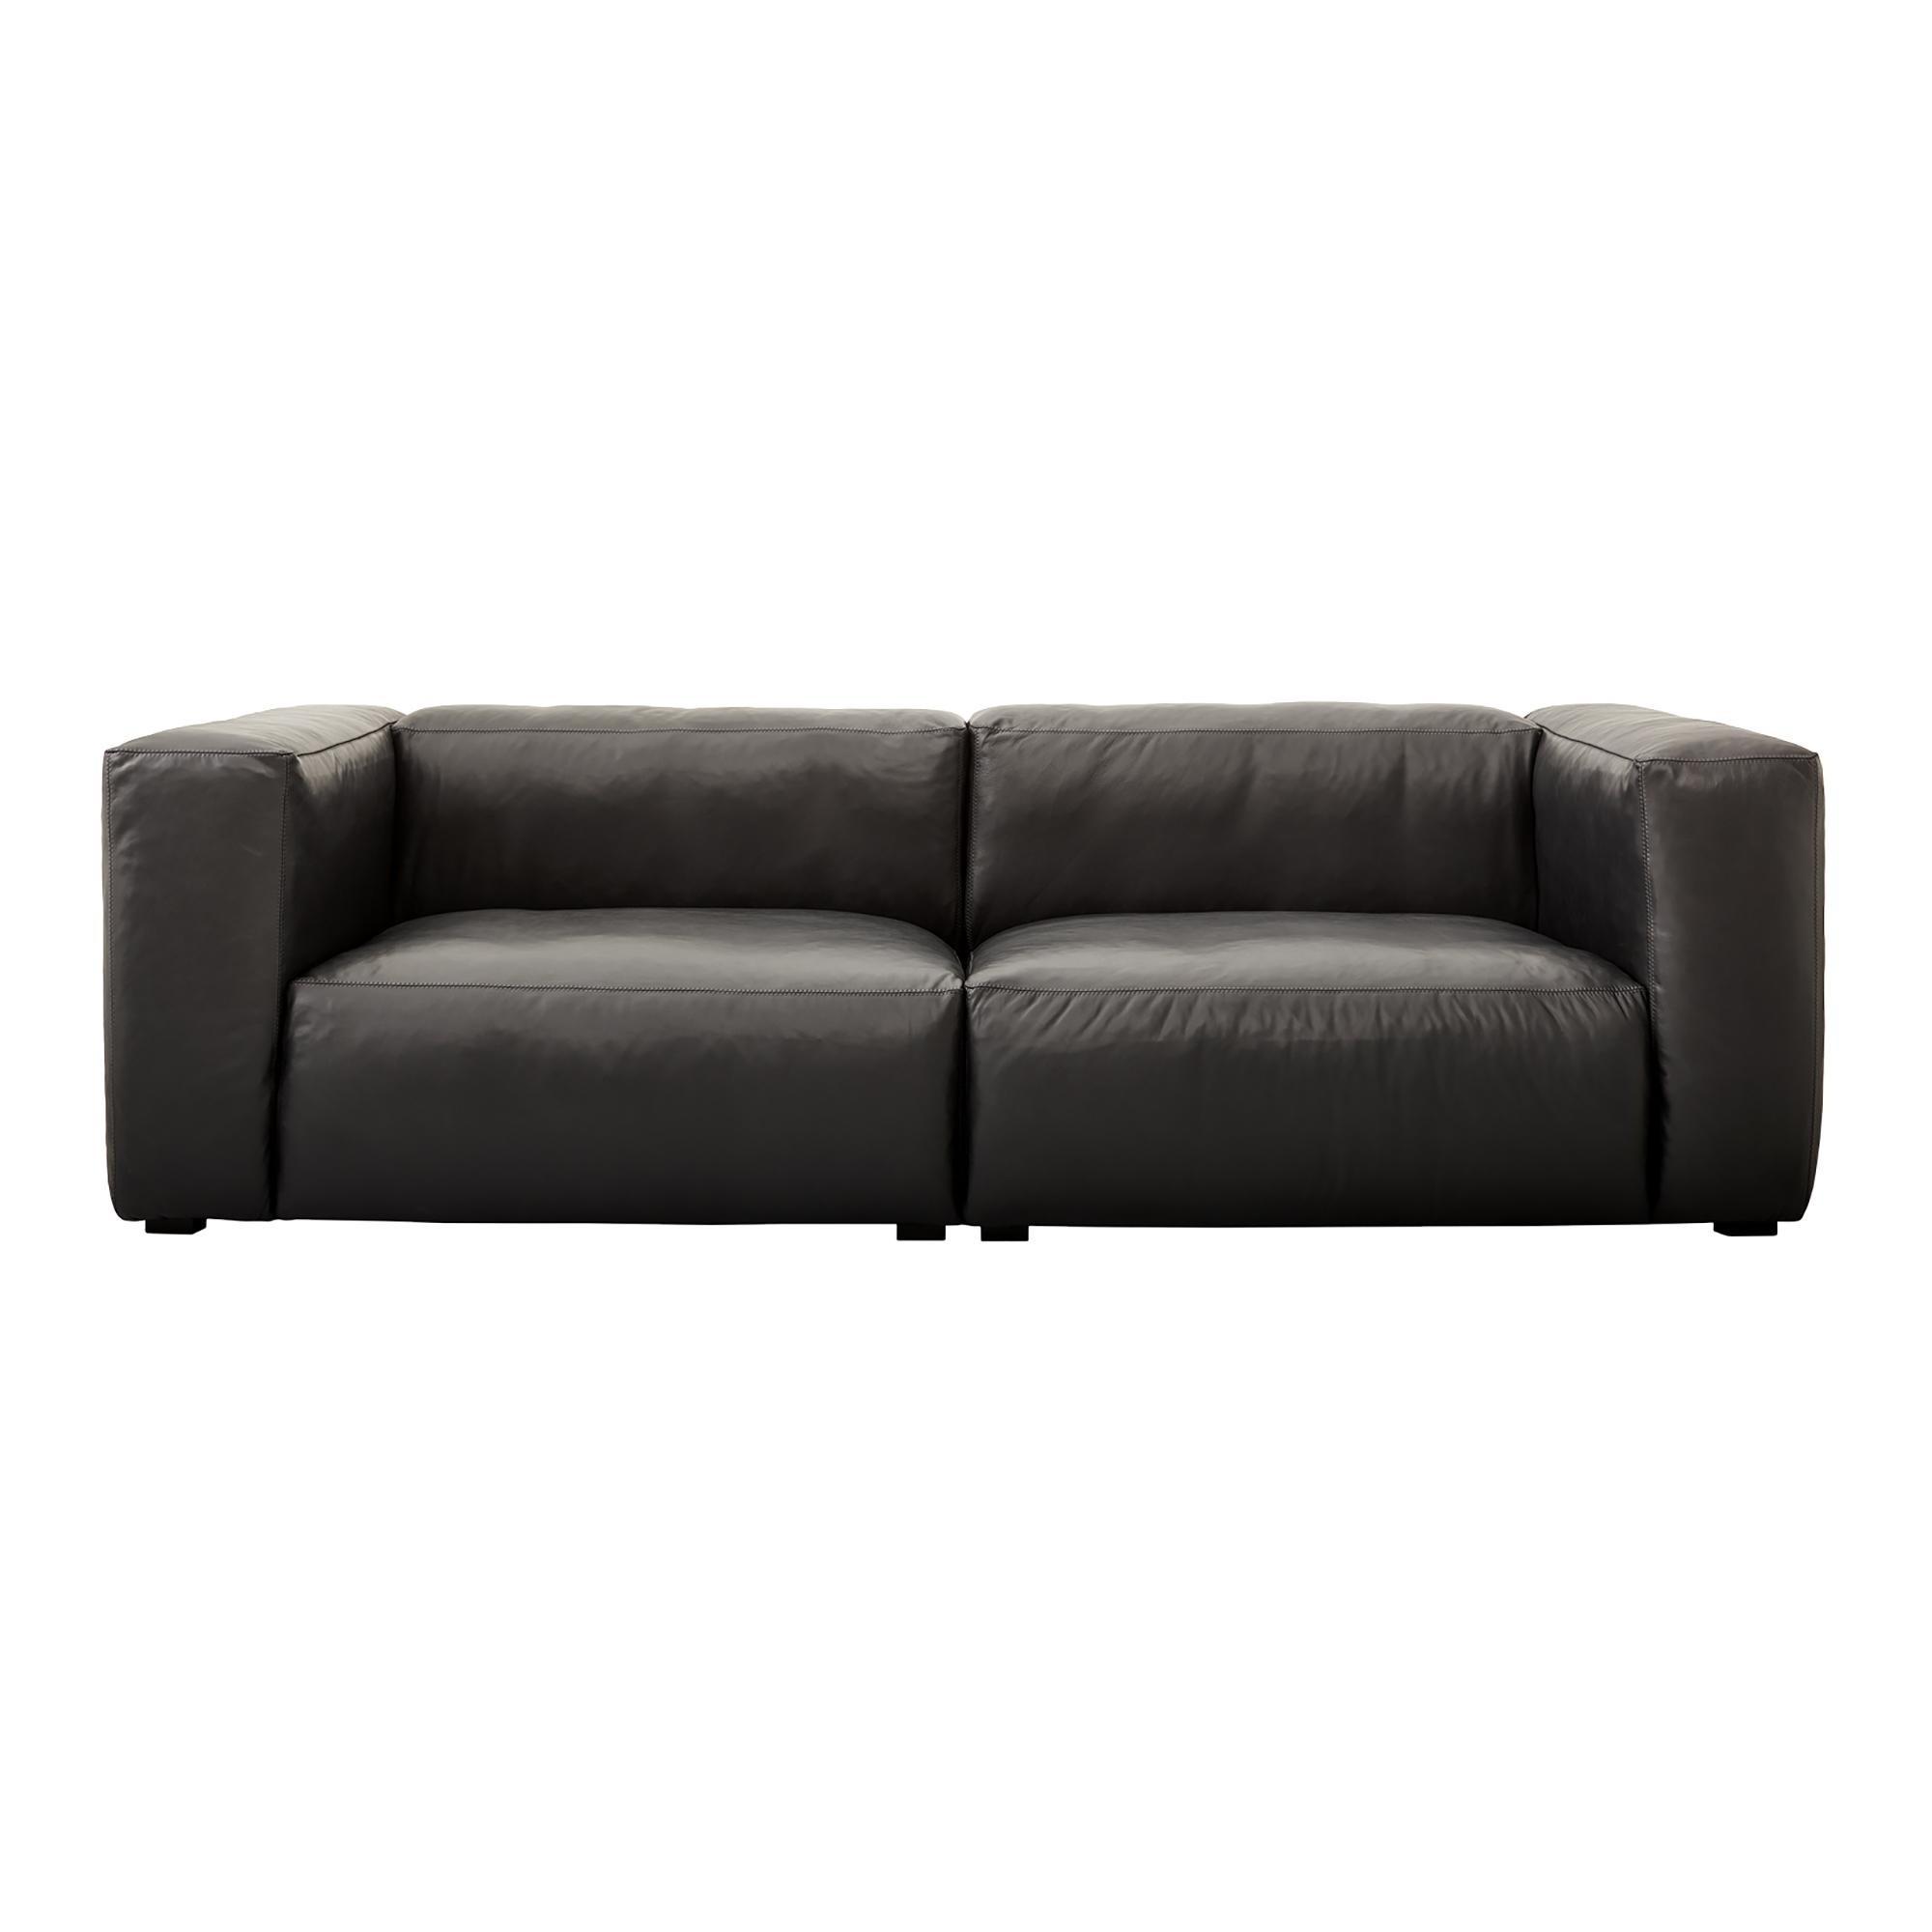 hay mags soft 2 5 zitsbank leer ambientedirect. Black Bedroom Furniture Sets. Home Design Ideas